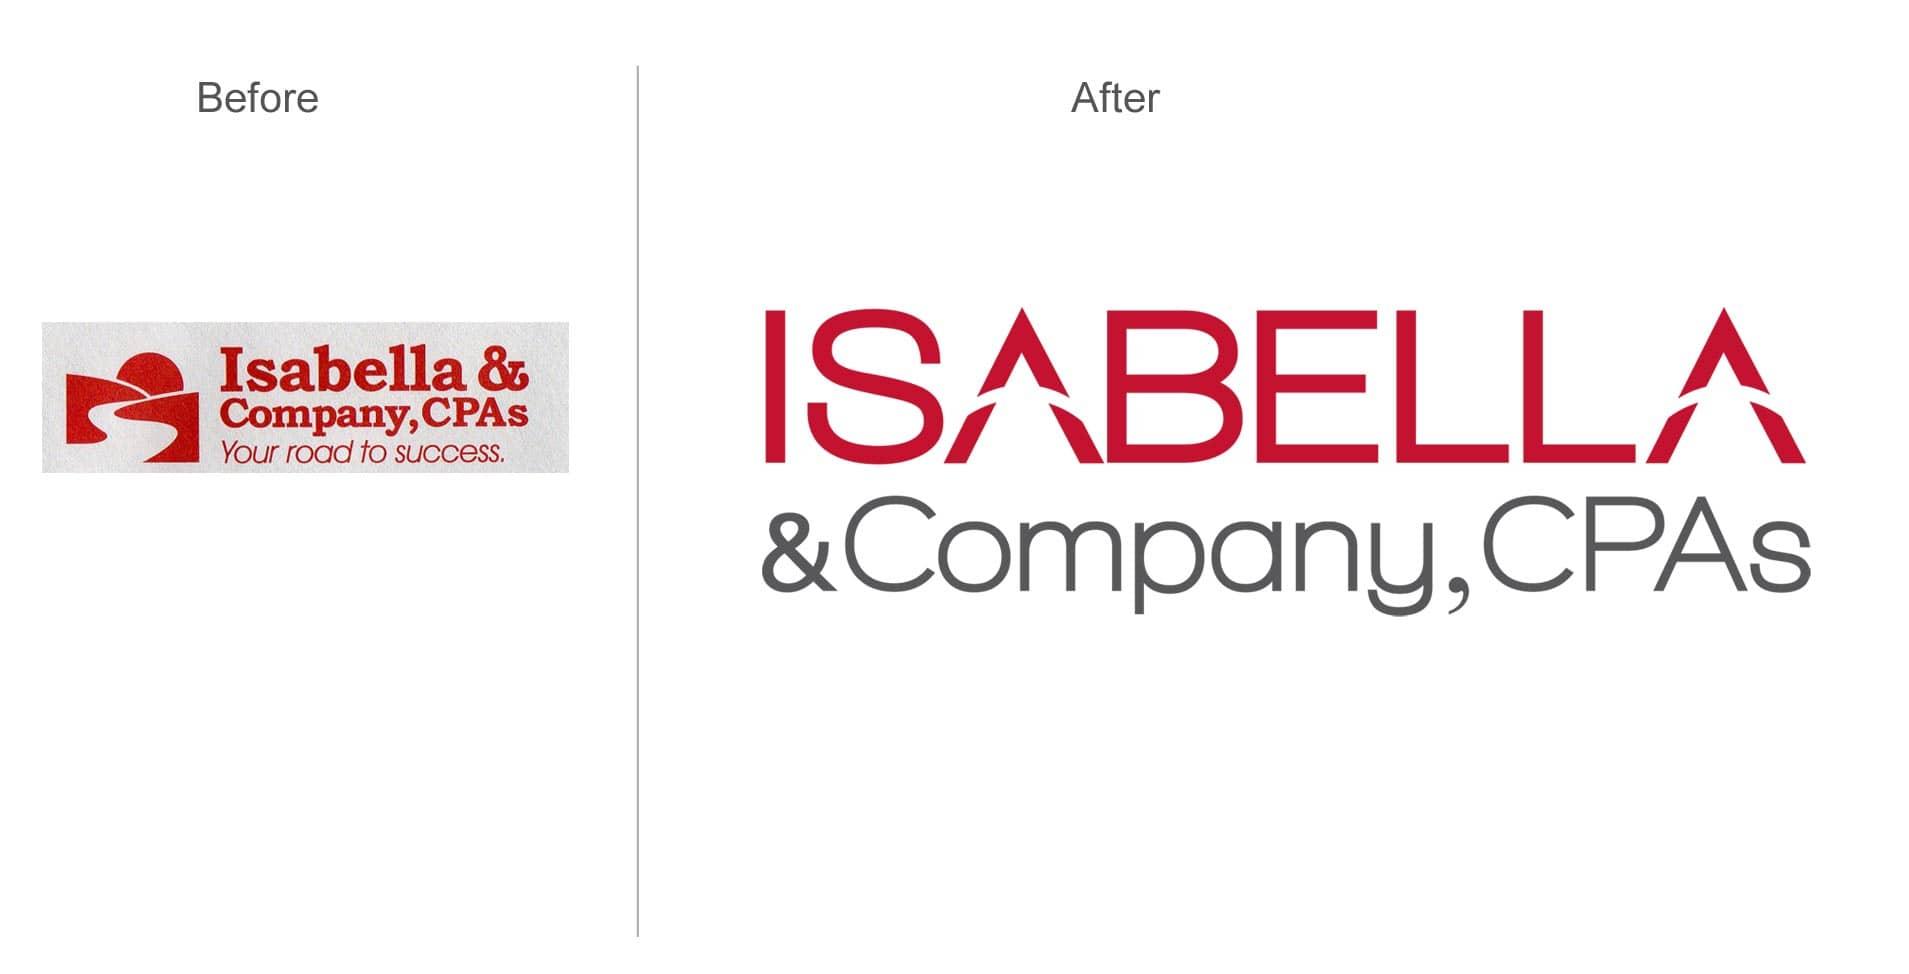 Isabella & Company, CPAs Brand Refresh